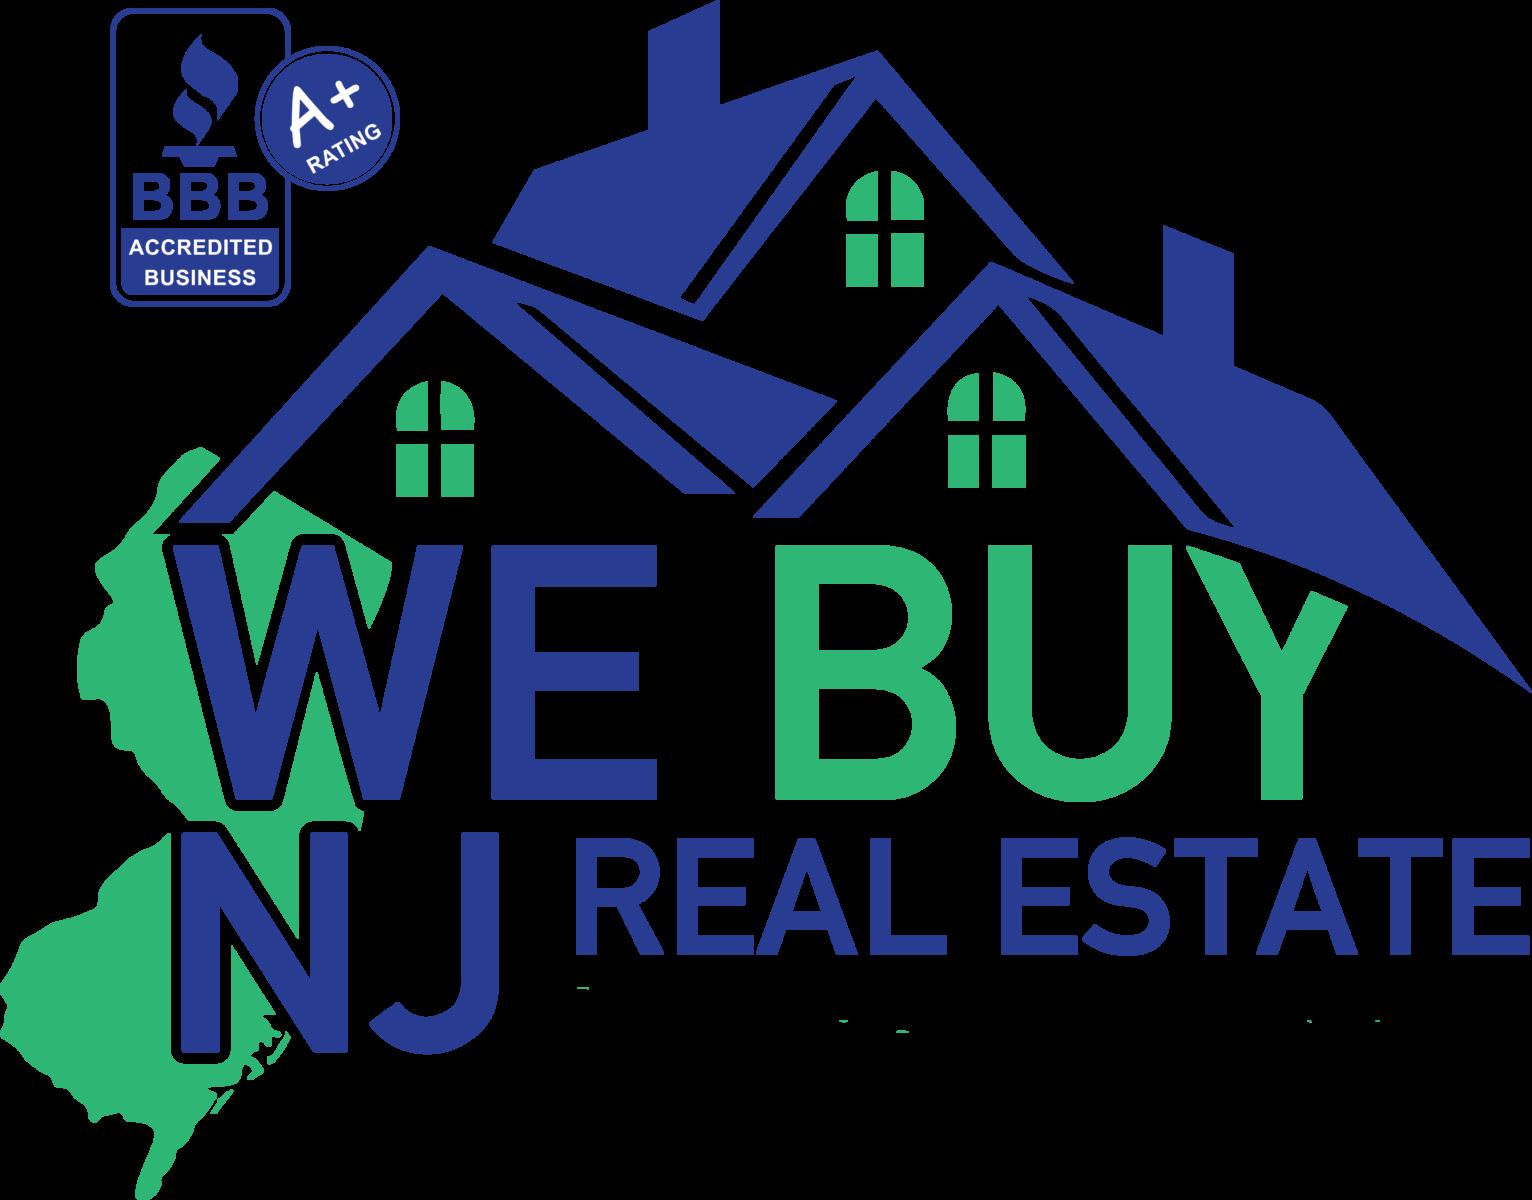 We Buy NJ Real Estate, LLC logo